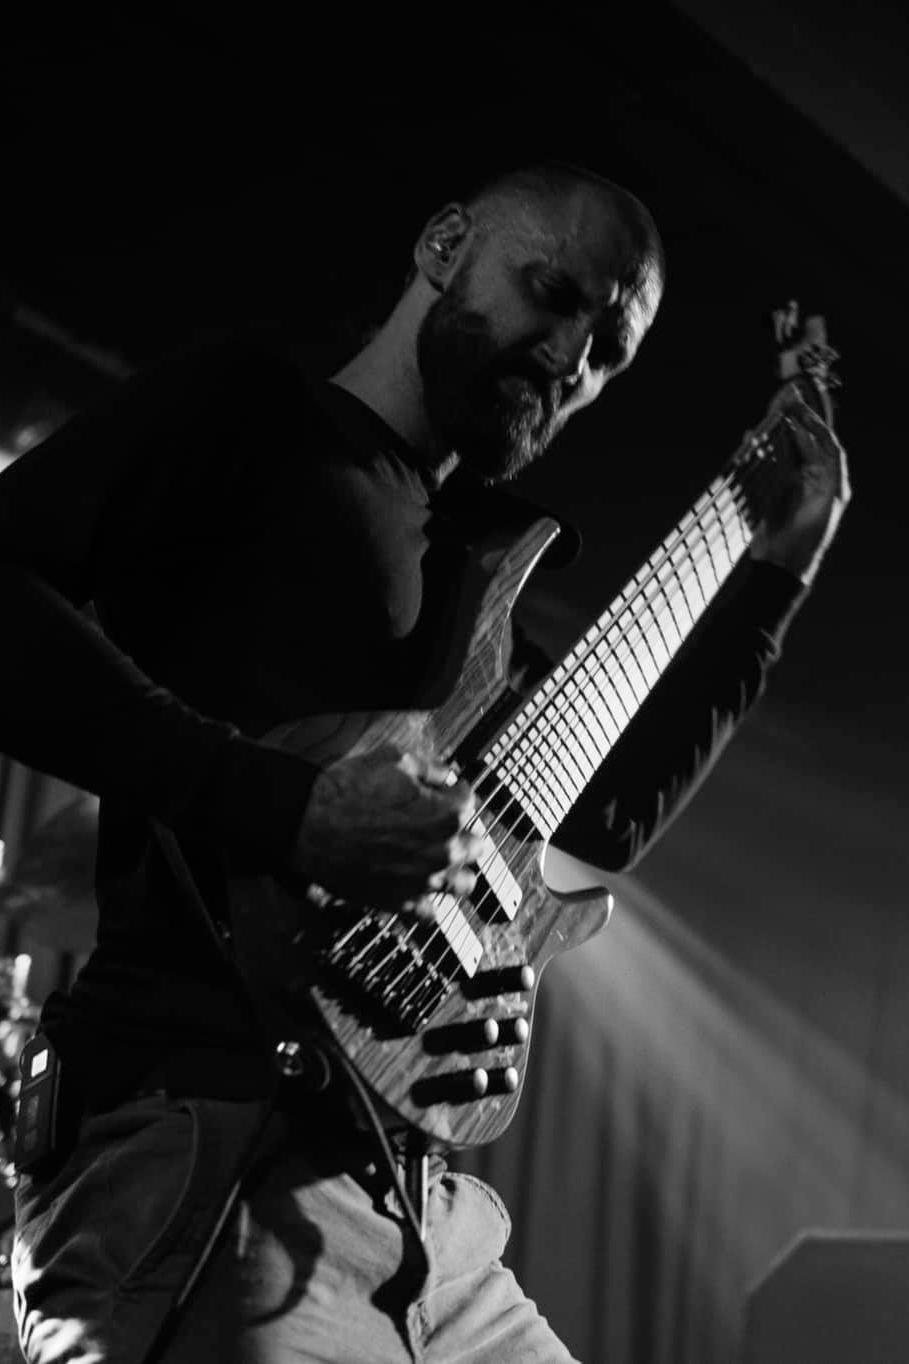 Ormsby Guitars Blade Of Horus Bass